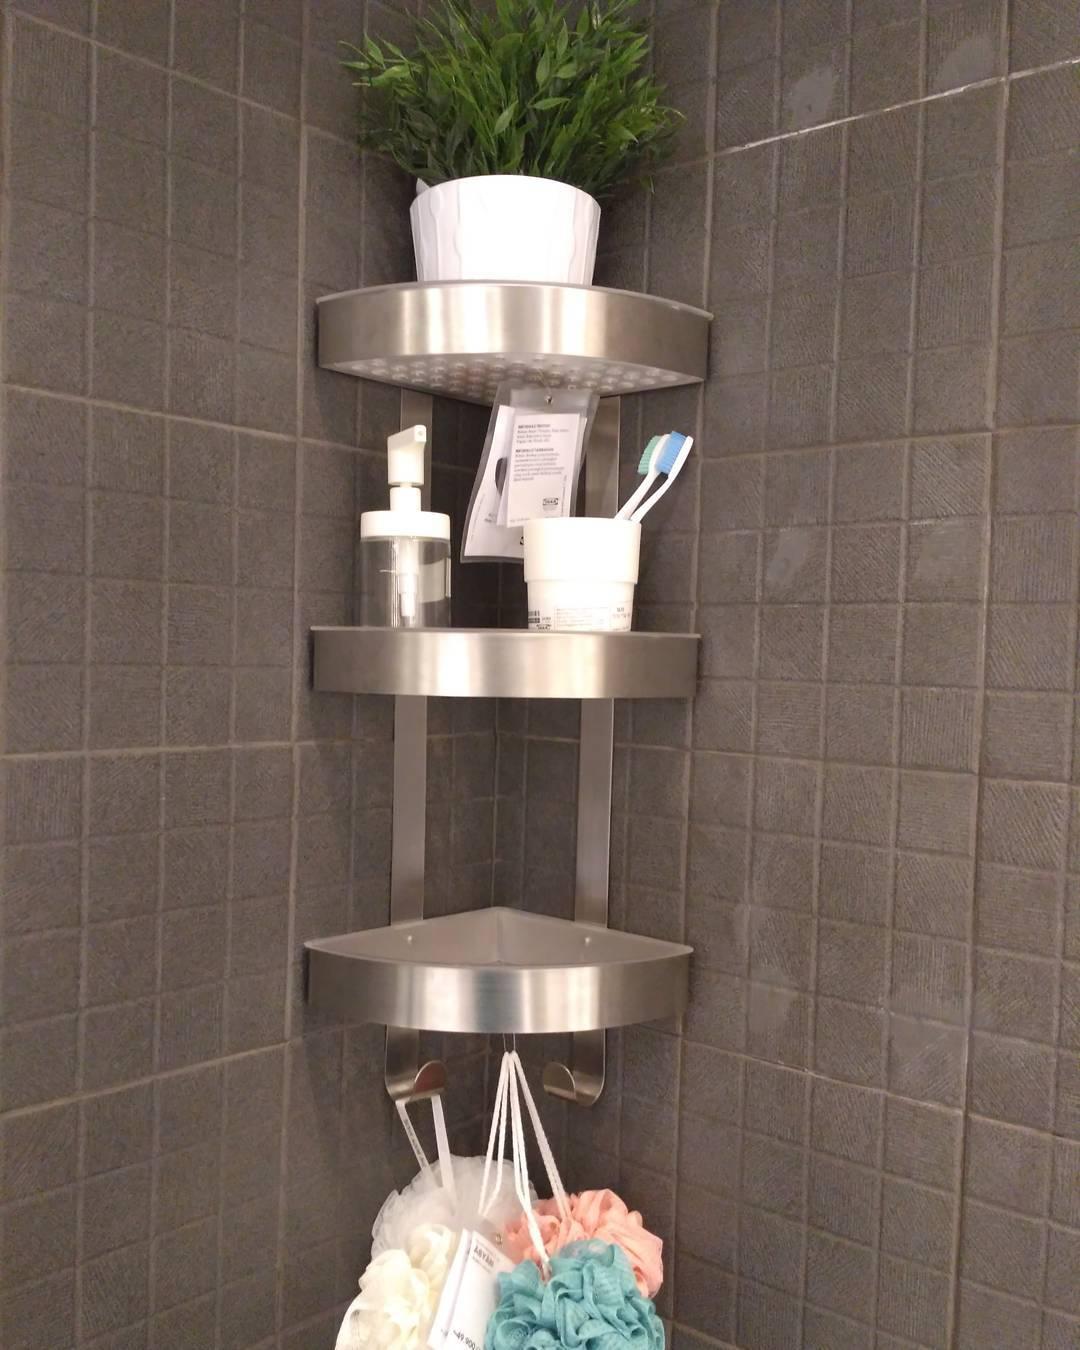 36 Model Rak Kamar Mandi Minimalis Kecil Tempat Sabun Sampo Dll 2021 Dekor Rumah Rak sabun di kamar mandi